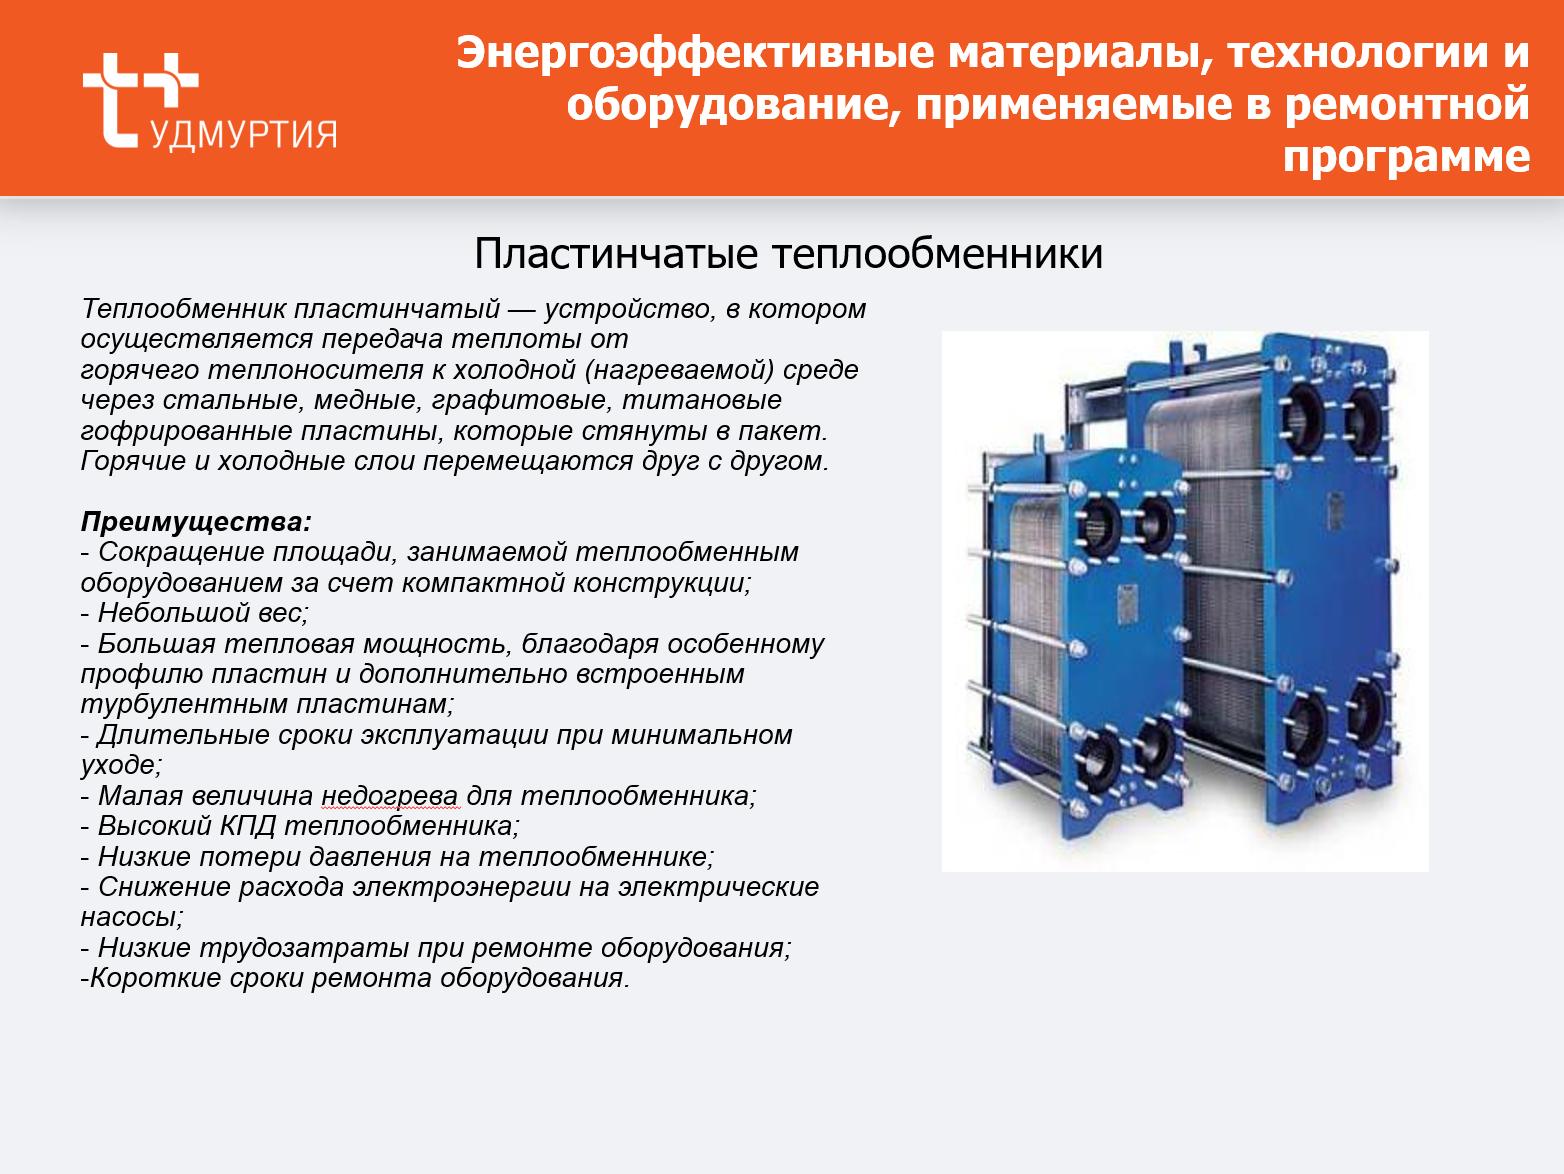 Документация на эксплуатацию пластинчатого теплообменника vaillant atmomag exclusiv потек теплообменник